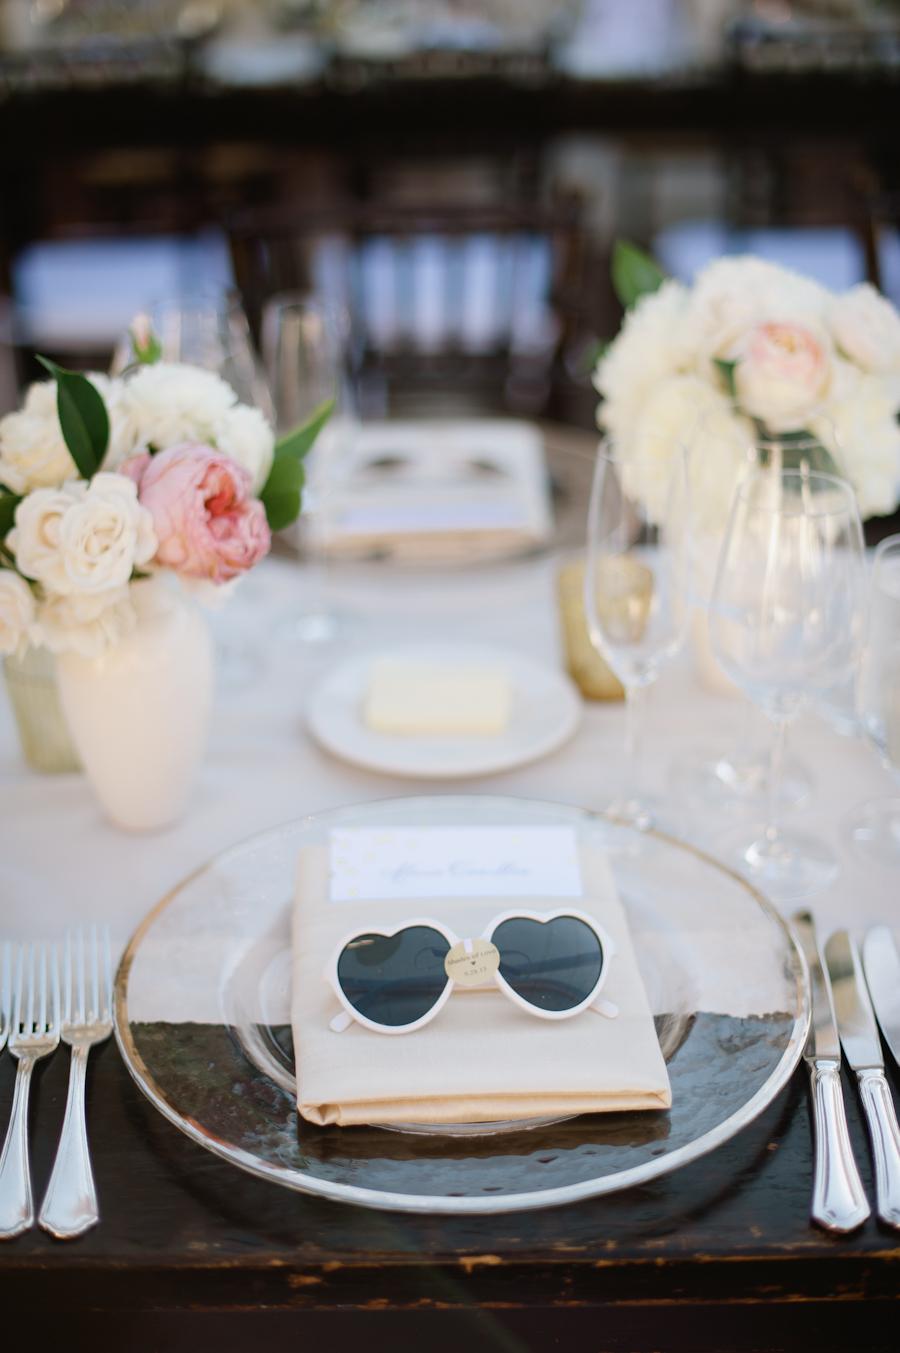 Sunglasses Wedding Favors - Elizabeth Anne Designs: The Wedding Blog